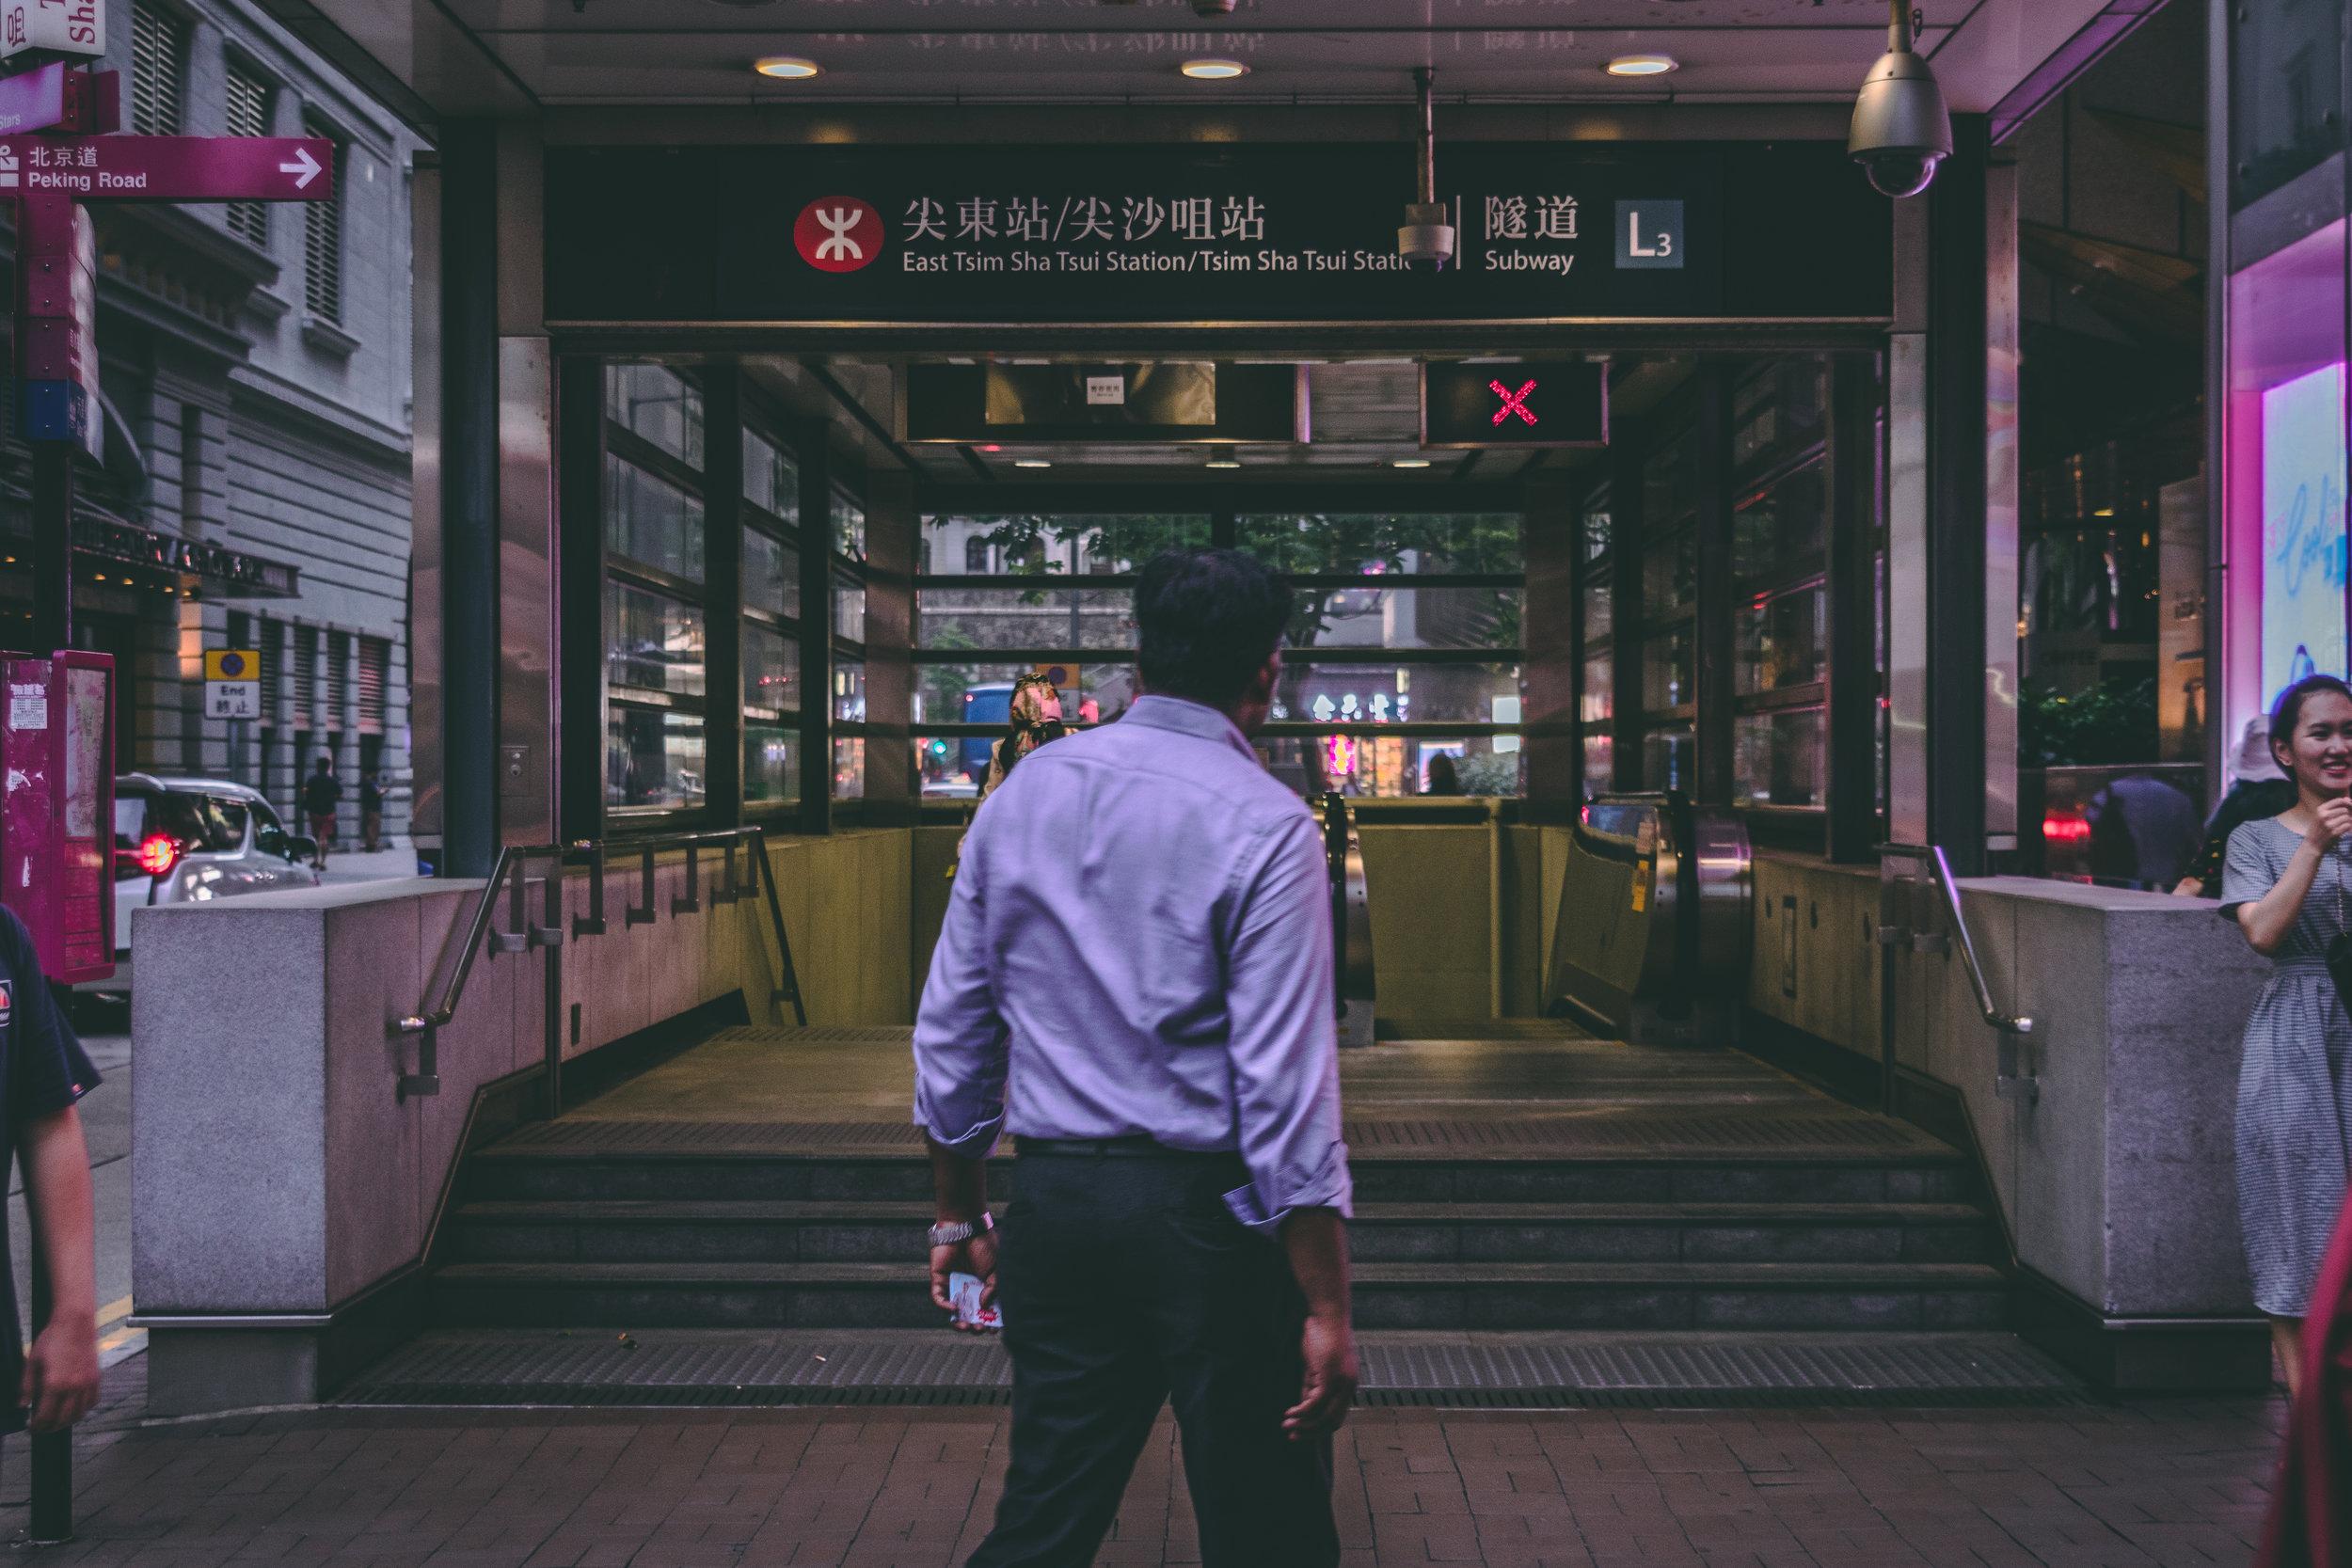 TST MTR Station